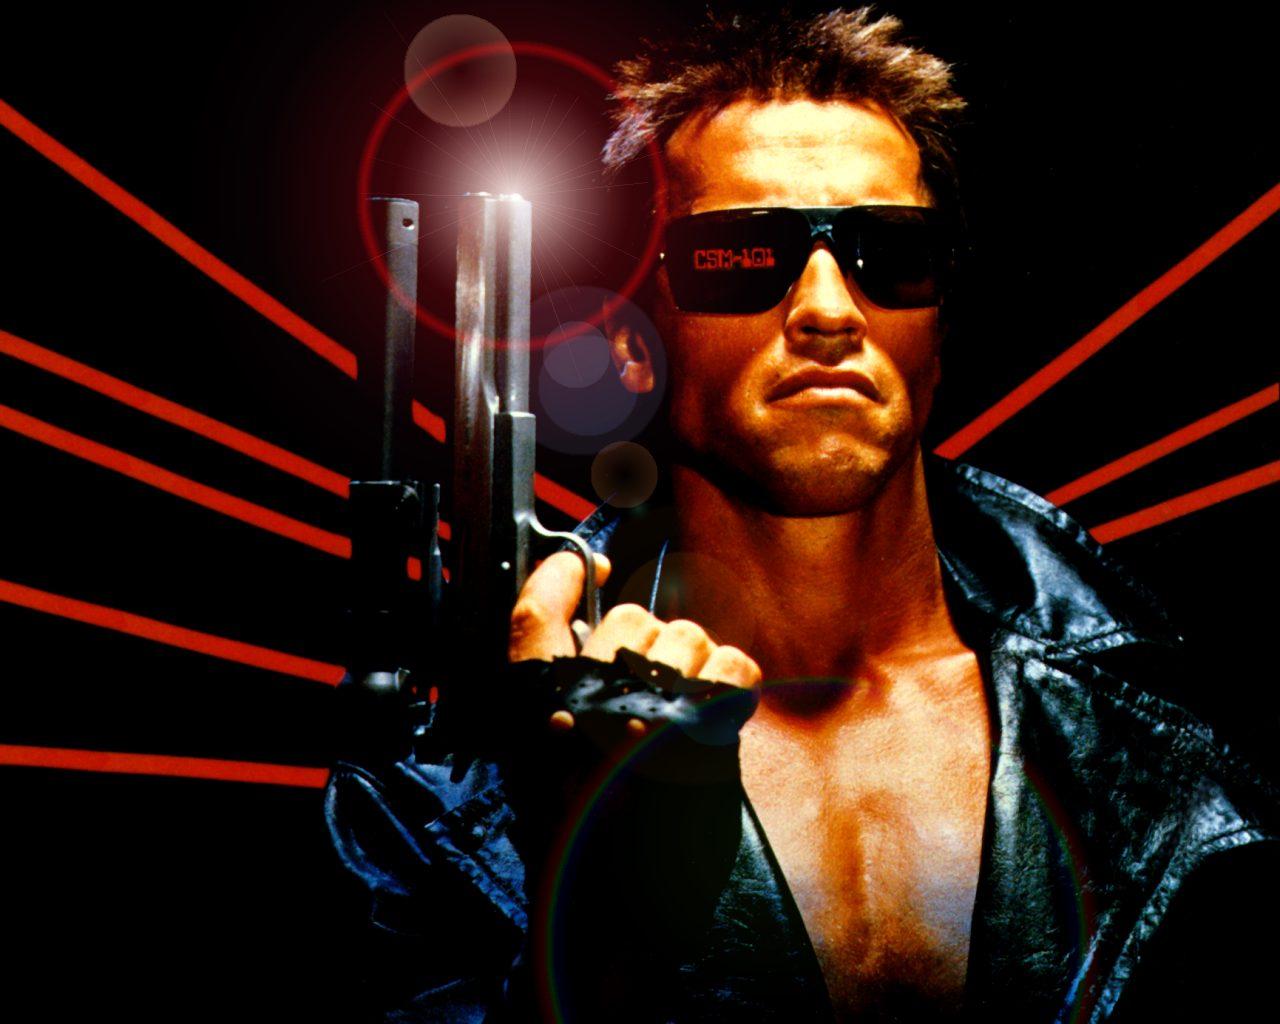 http://1.bp.blogspot.com/-M3_BbpDAhvA/TsD_dYhR45I/AAAAAAAAAmY/ehzYU54ff94/s1600/The_Terminator%252C_1984%252C_Arnold_Schwarzenegger.jpg